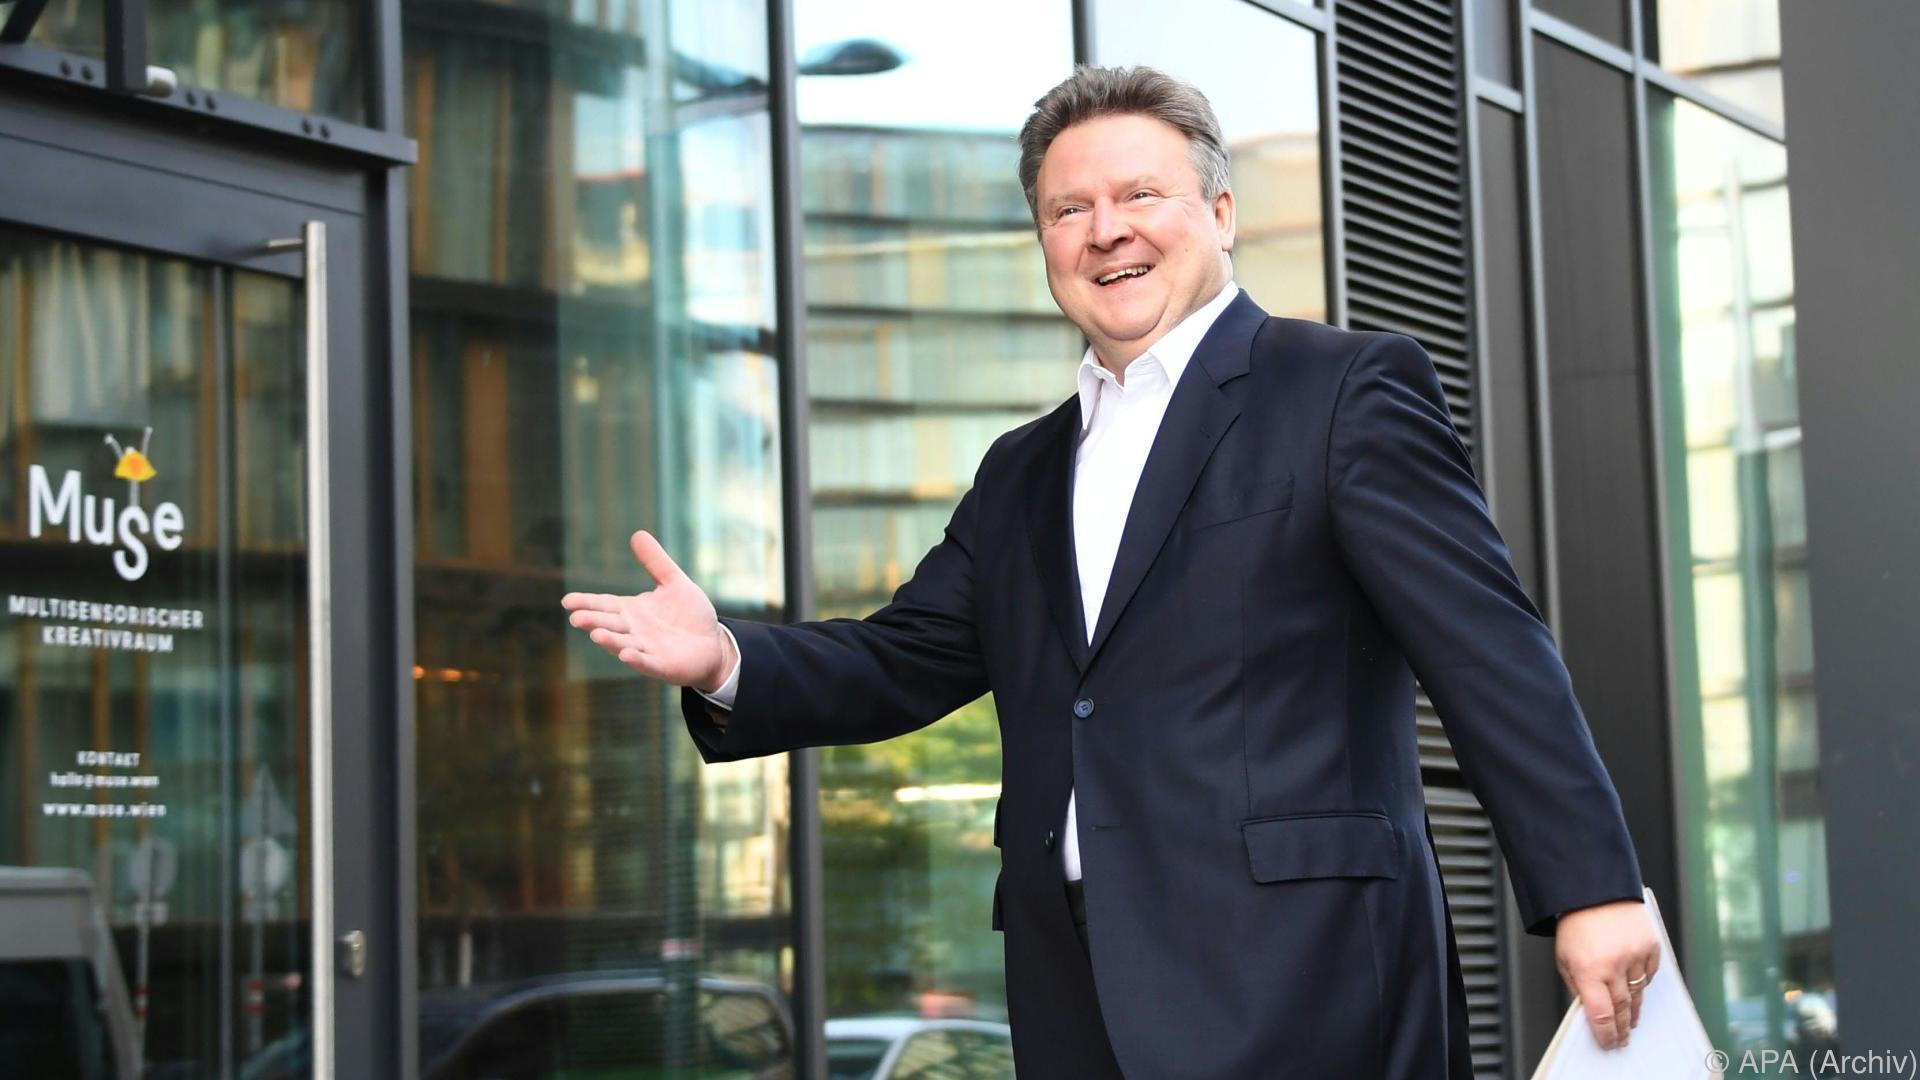 Ludwig komplettiert SPÖ-Verhandlungsteam